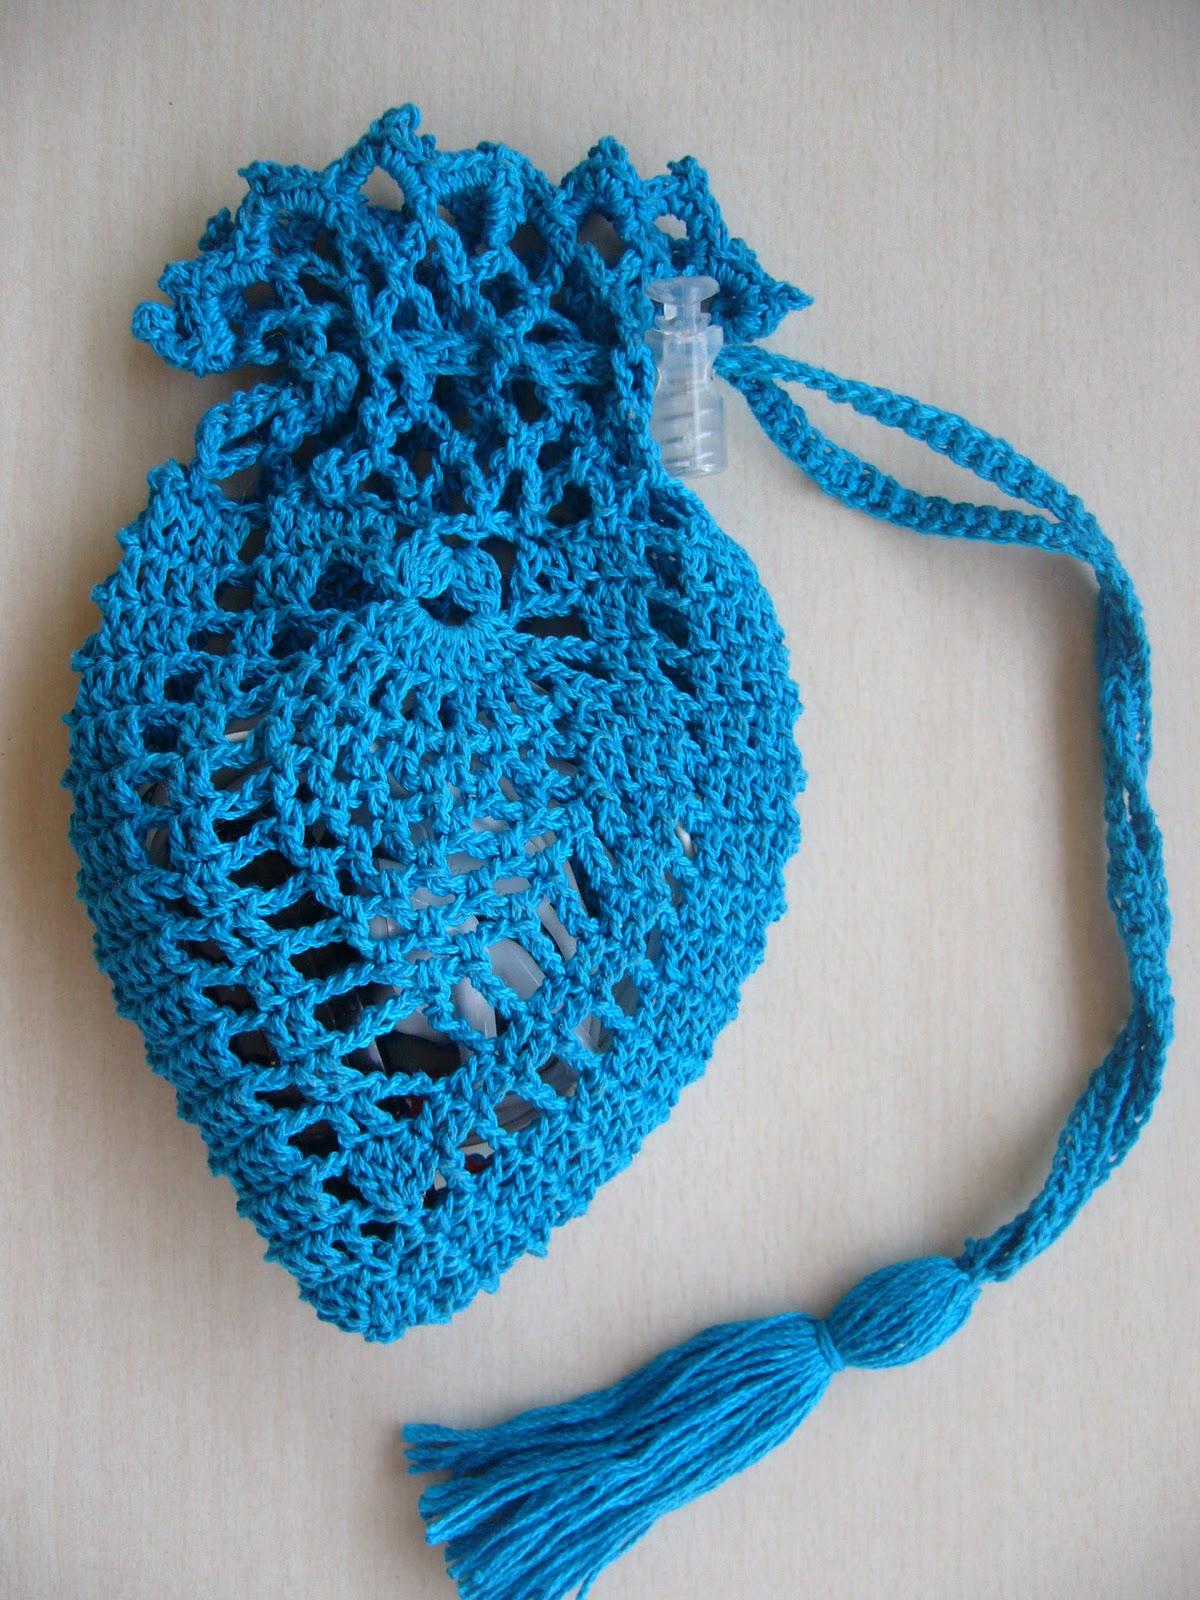 Pineapple Crochet Bag Pattern : Crochetkari: Crochet Pineapple Pouch